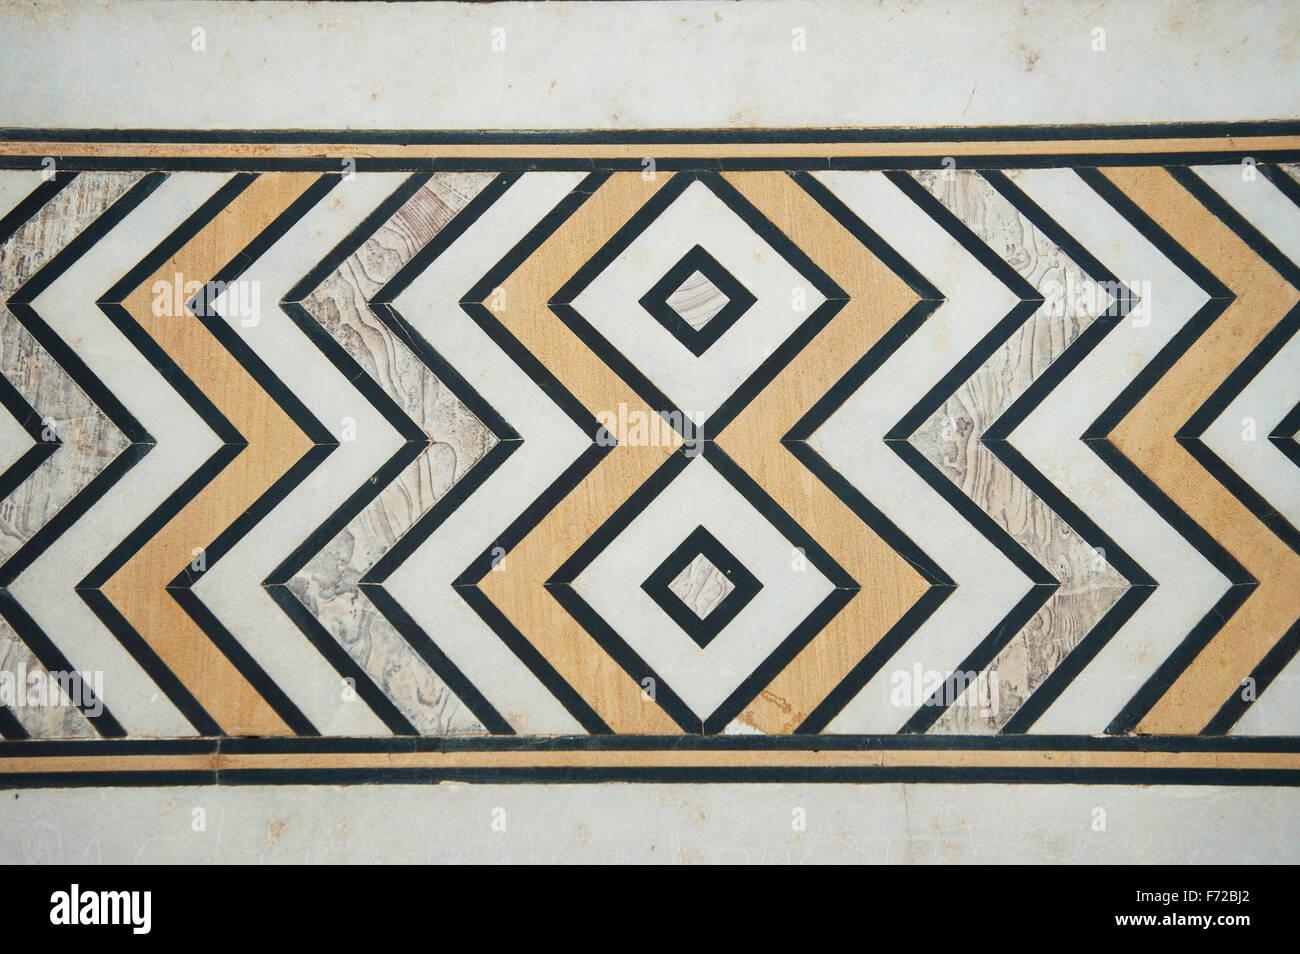 Marble floor tiles design  taj mahal  agra  uttar pradesh  india  asia. Marble floor tiles design  taj mahal  agra  uttar pradesh  india